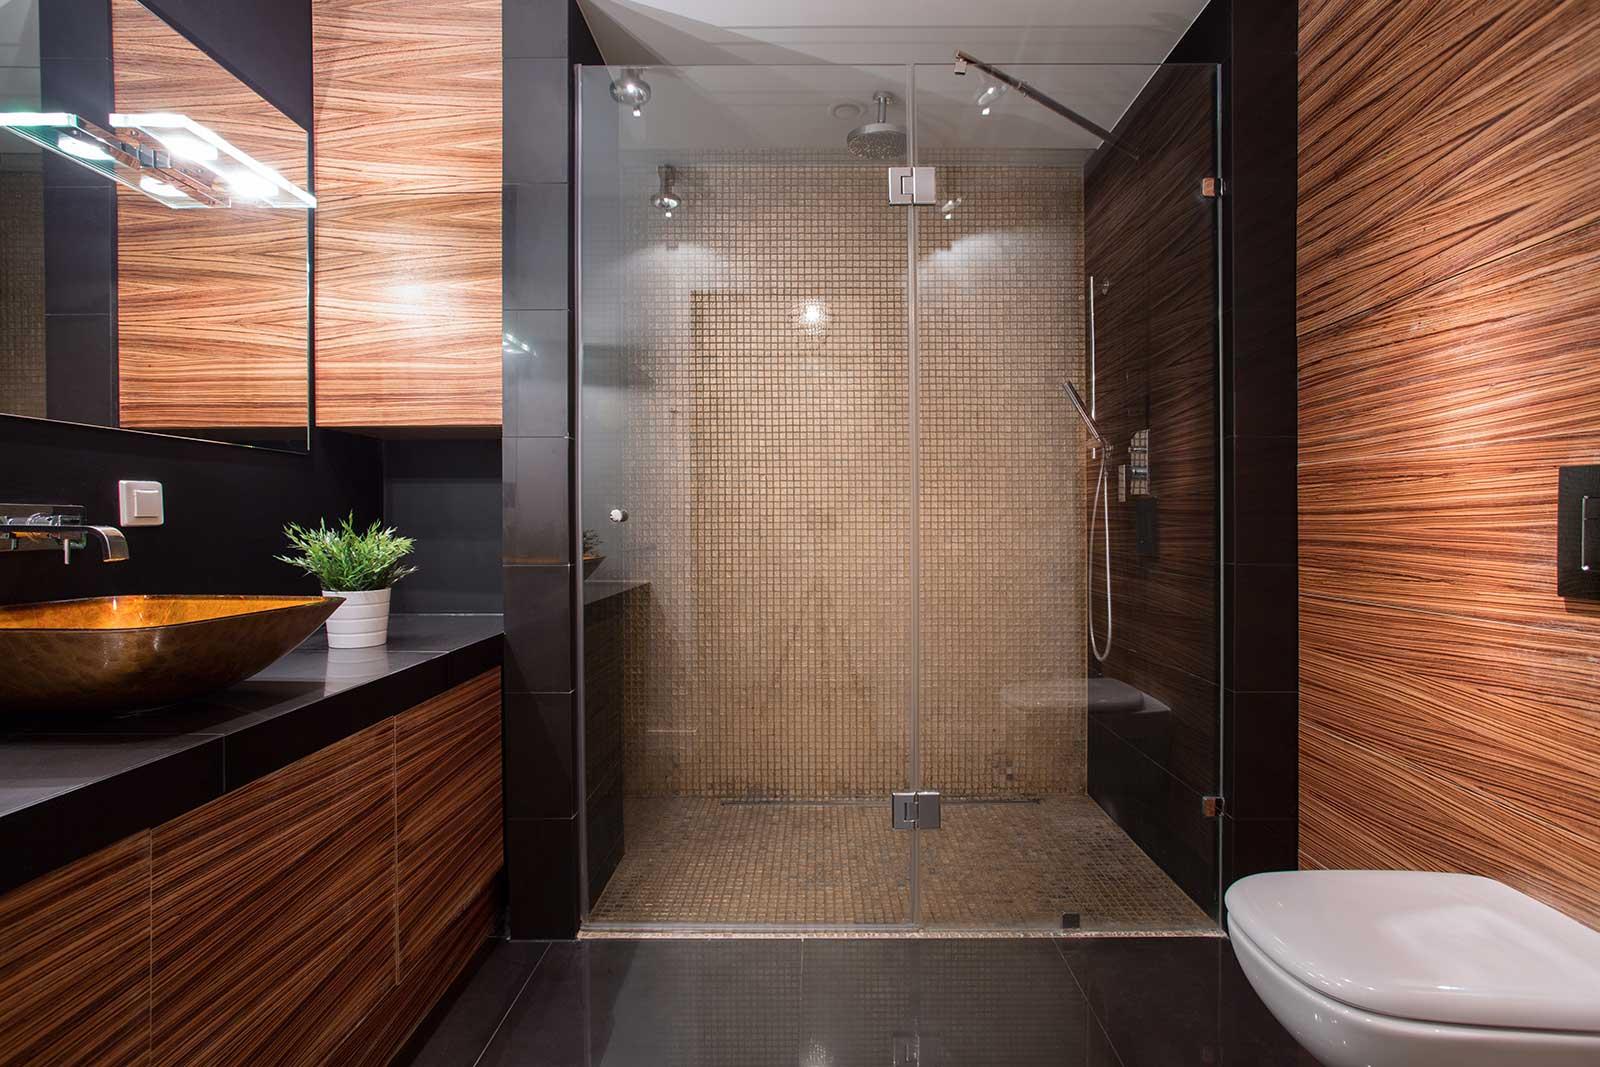 wet-room-installers-north-west-london-slider-4